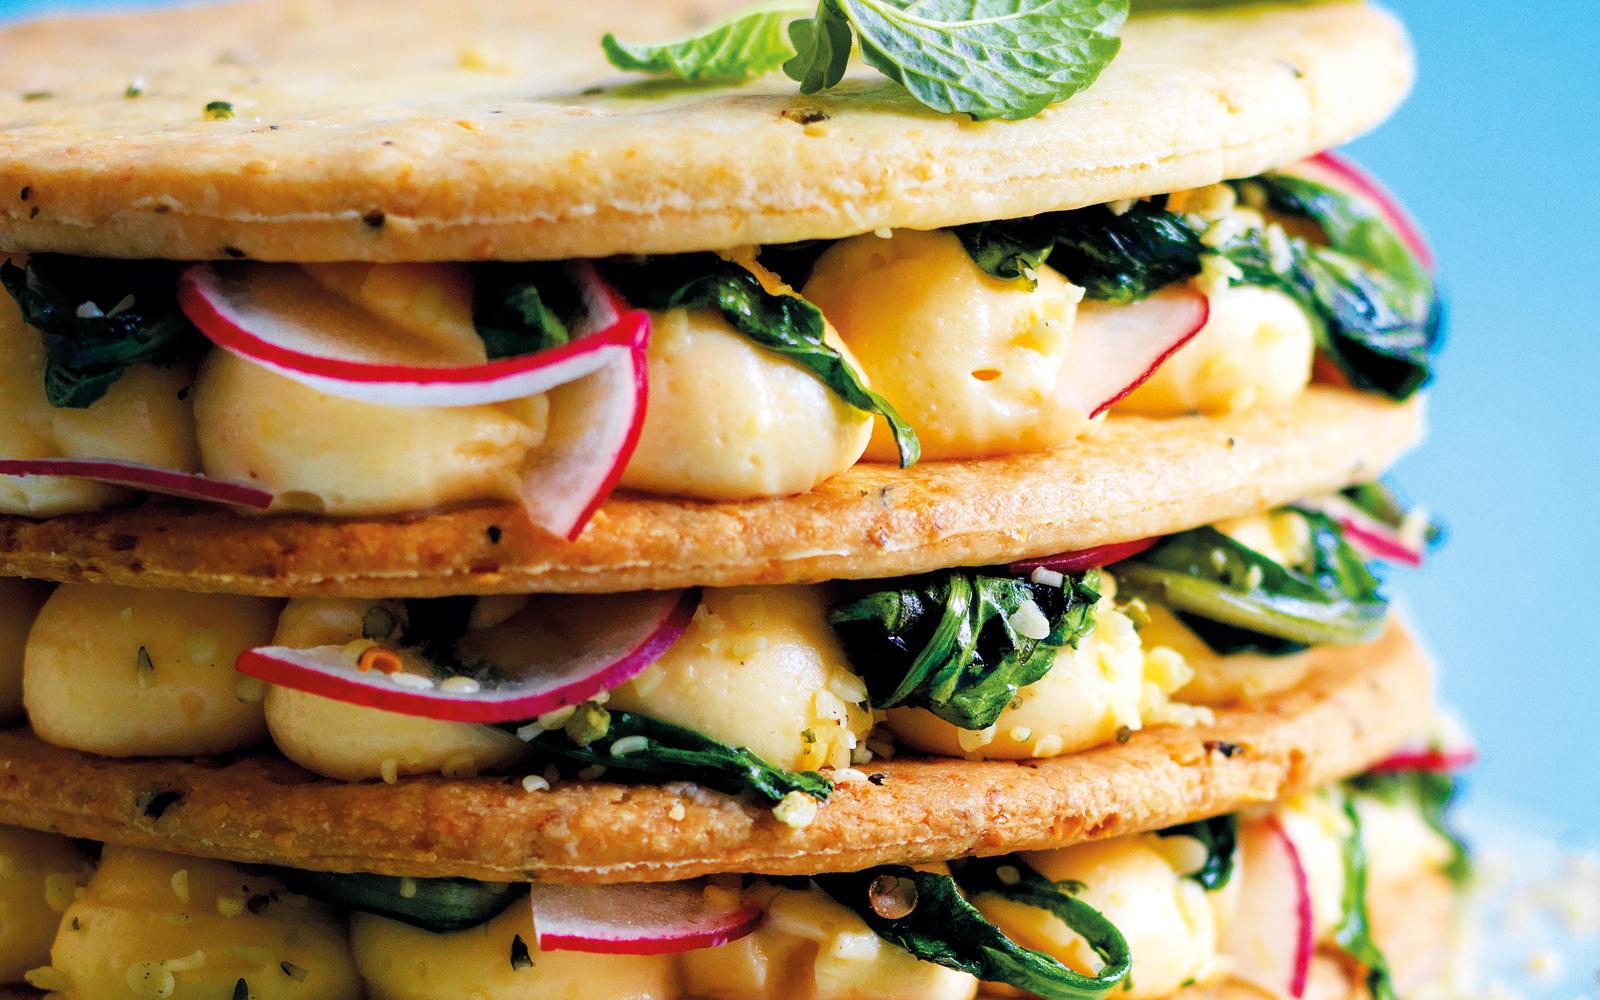 crema-salata,-ravanelli-e-tarassaco-tra-dischi-di-brisee